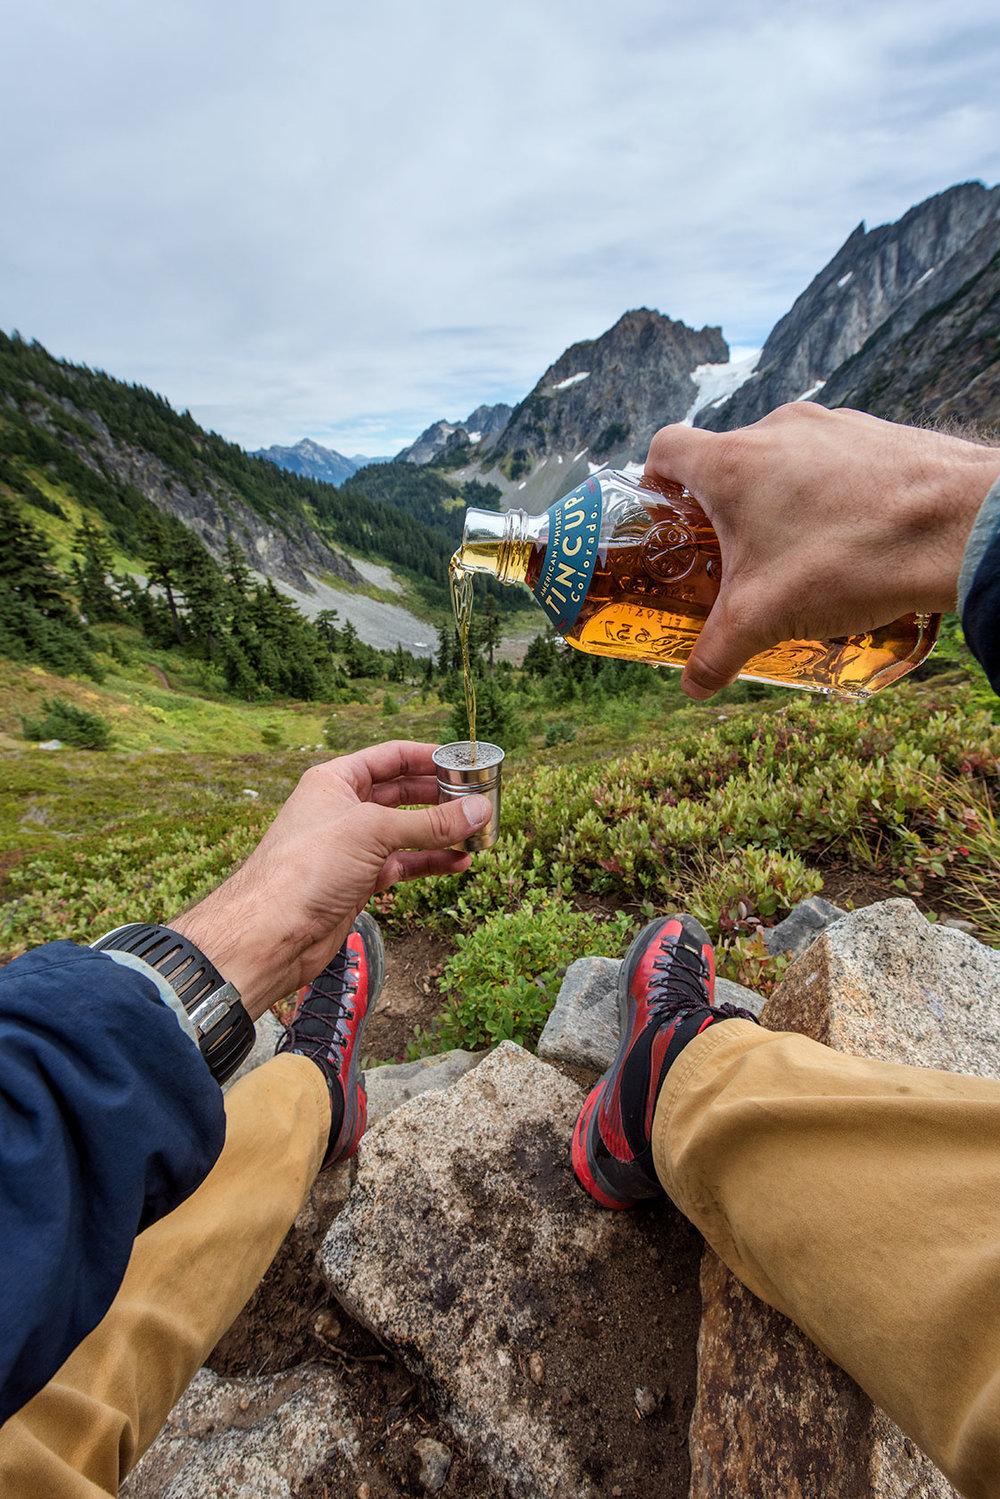 austin-trigg-whiskey-lifestyle-washington-cascade-pass-north-cascades-pov.jpg